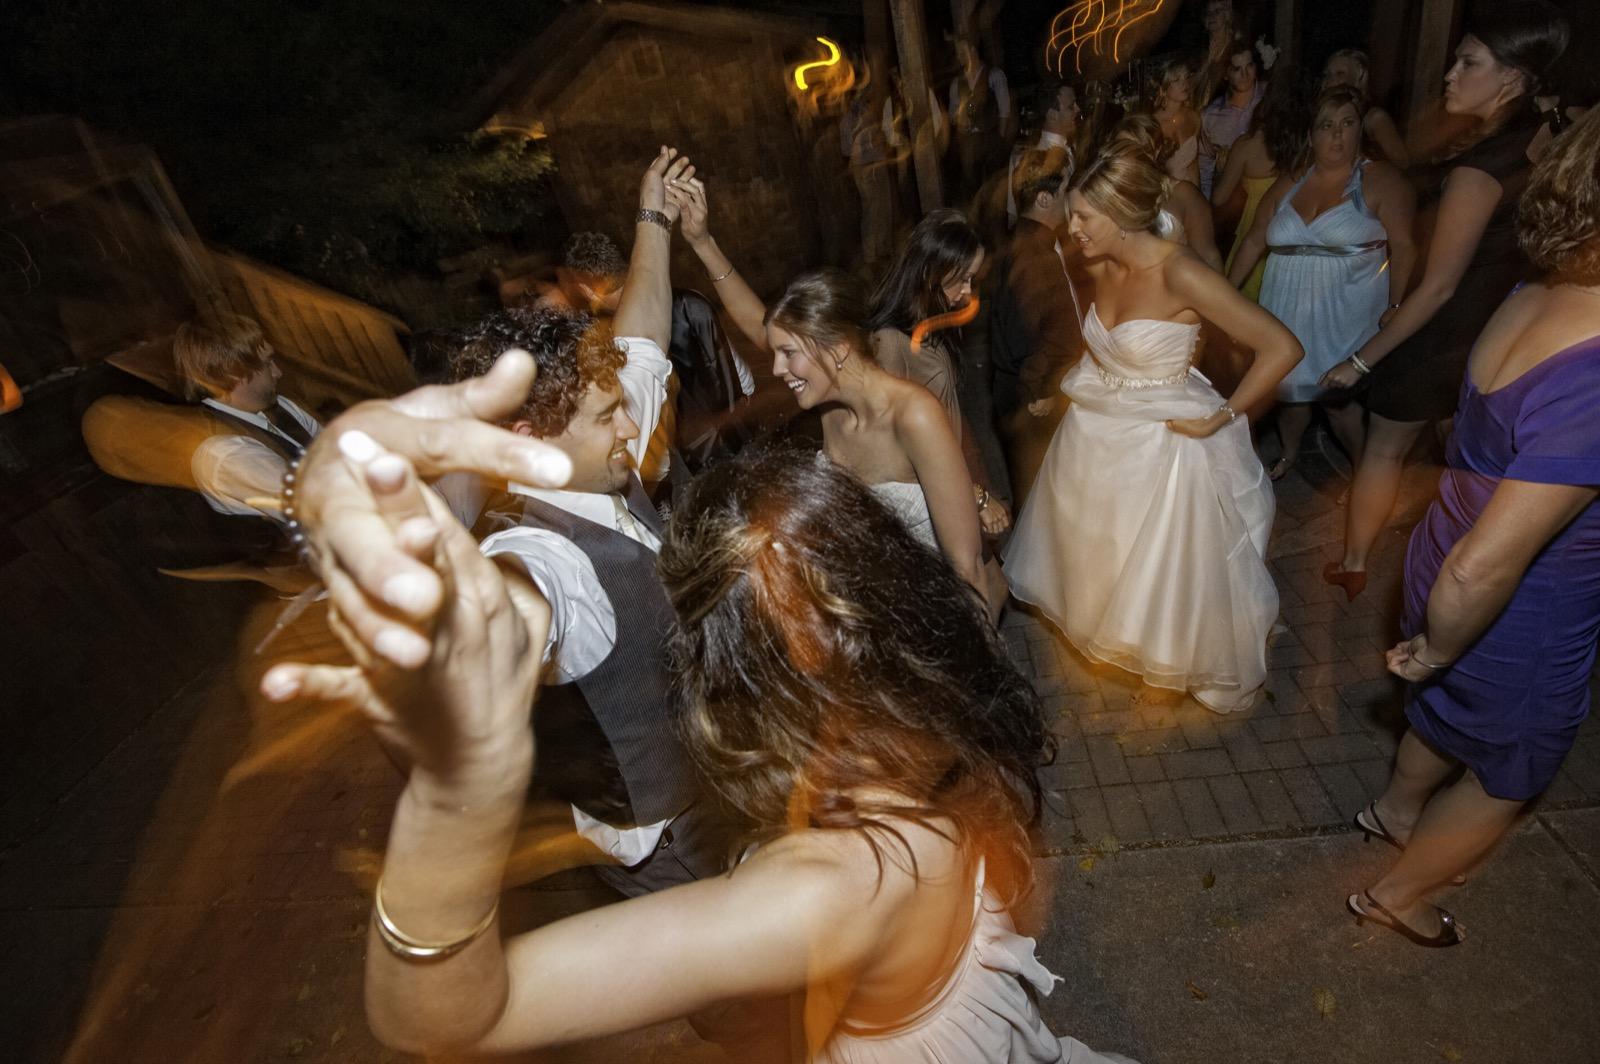 sooke-wedding-photographers-craidelonna-oceanedge-lodge-wedding-88.jpg